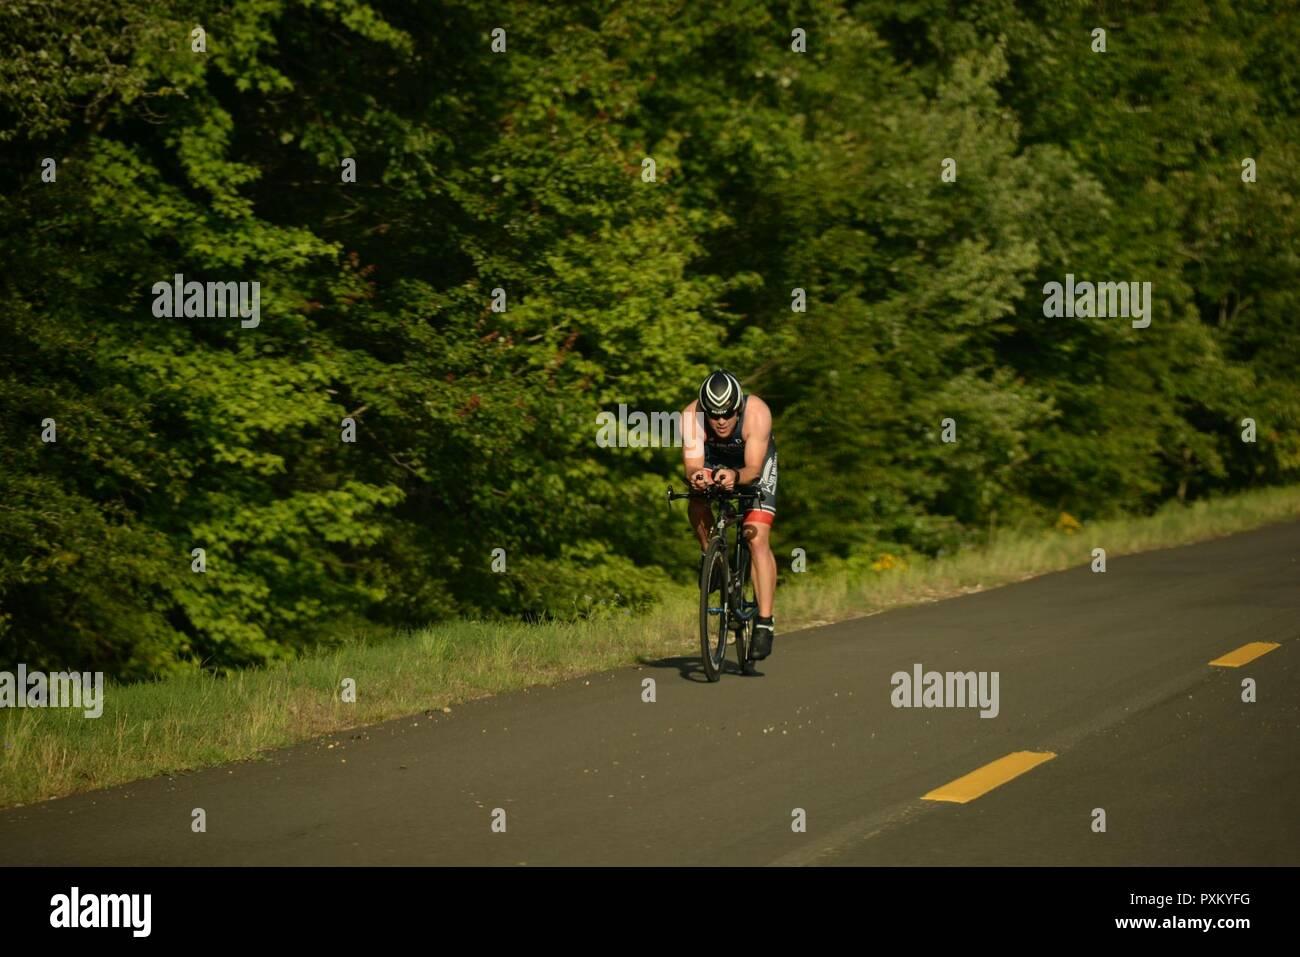 Rides Down Perimeter Rd During A Triathlon June 3 2017 On Columbus Air Force Base Mississippi Goncalves Finished The 22 Kilometer Bike